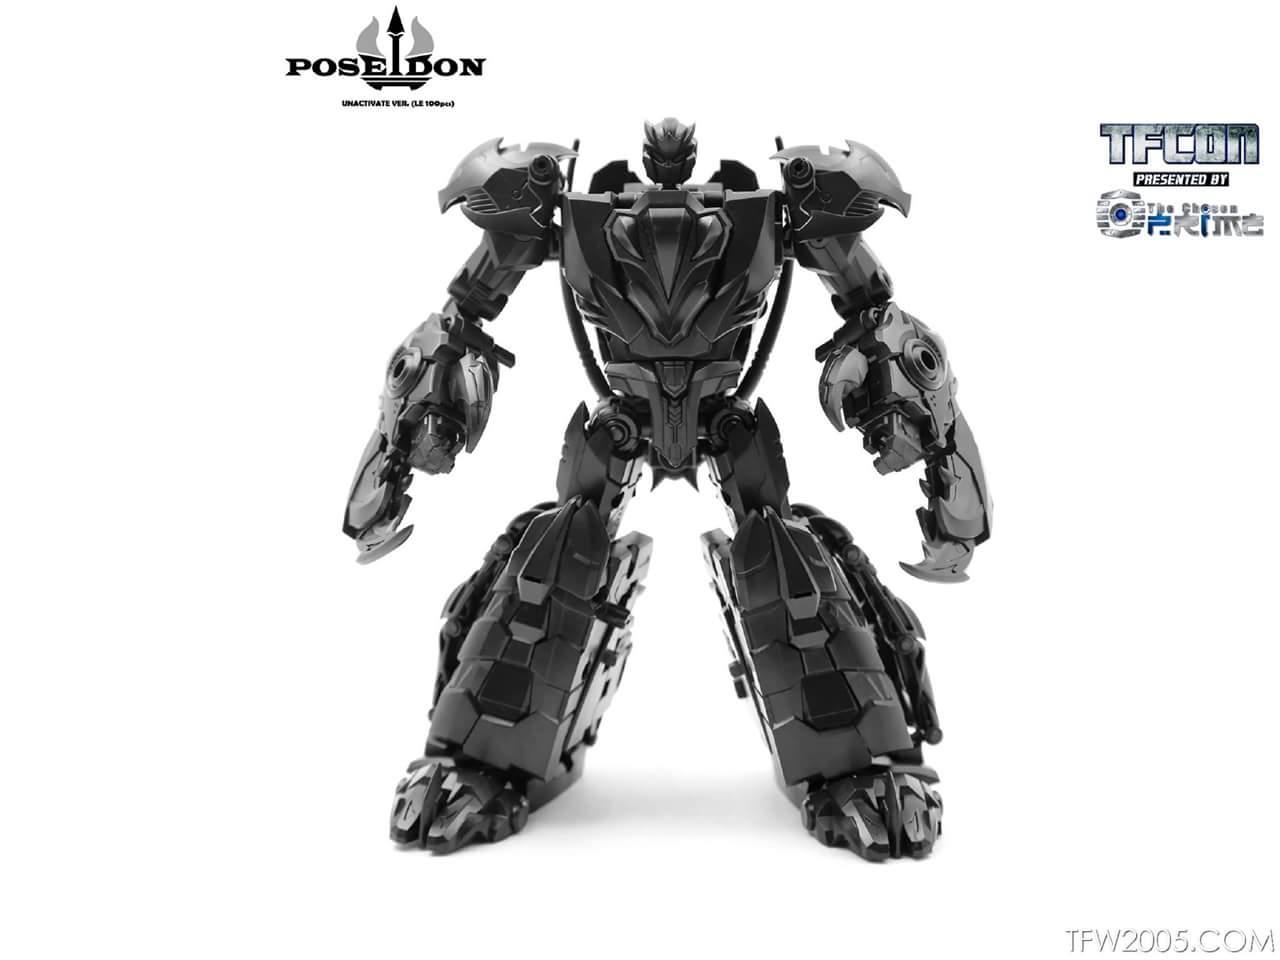 [TFC Toys] Produit Tiers - Jouet Poseidon - aka Piranacon/King Poseidon (TF Masterforce) - Page 6 VHlrm2nP_o